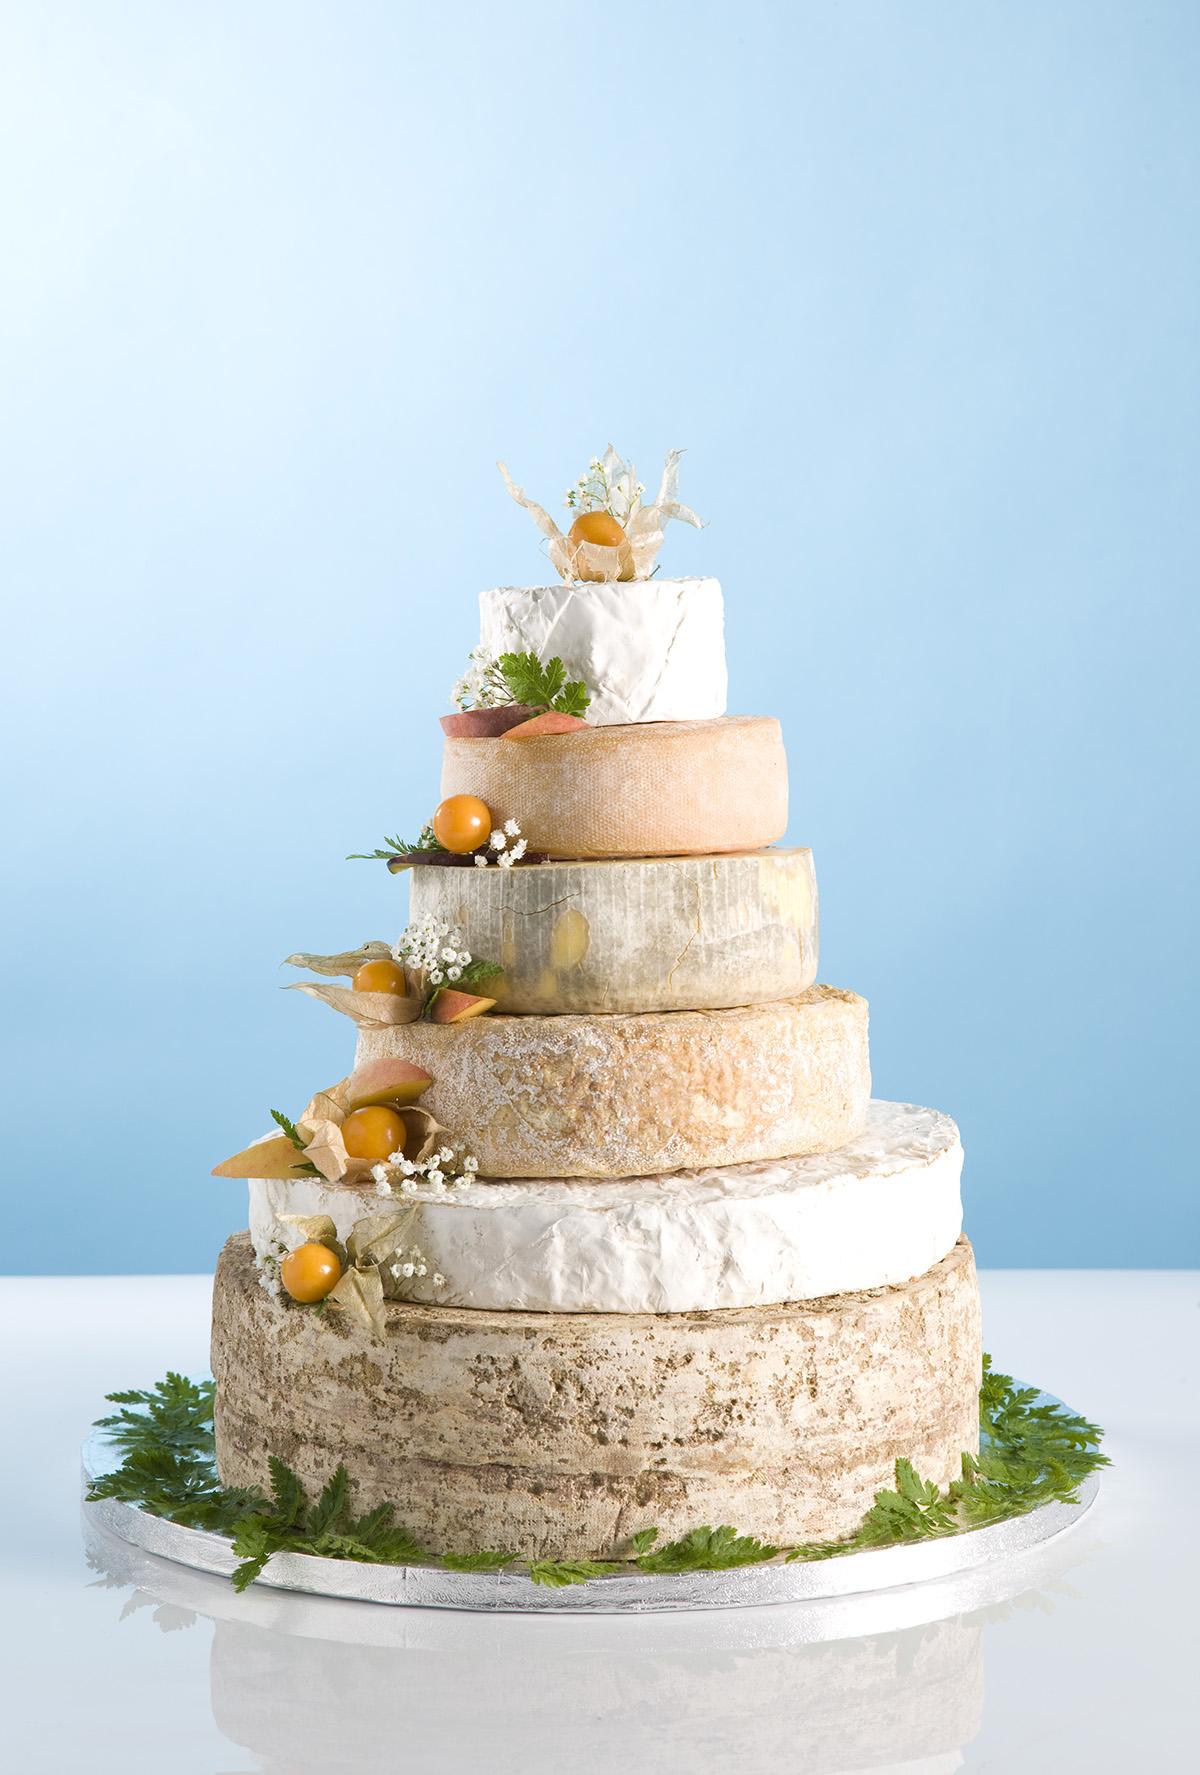 Cheesecake Wedding Cake Related Keywords & Suggestions